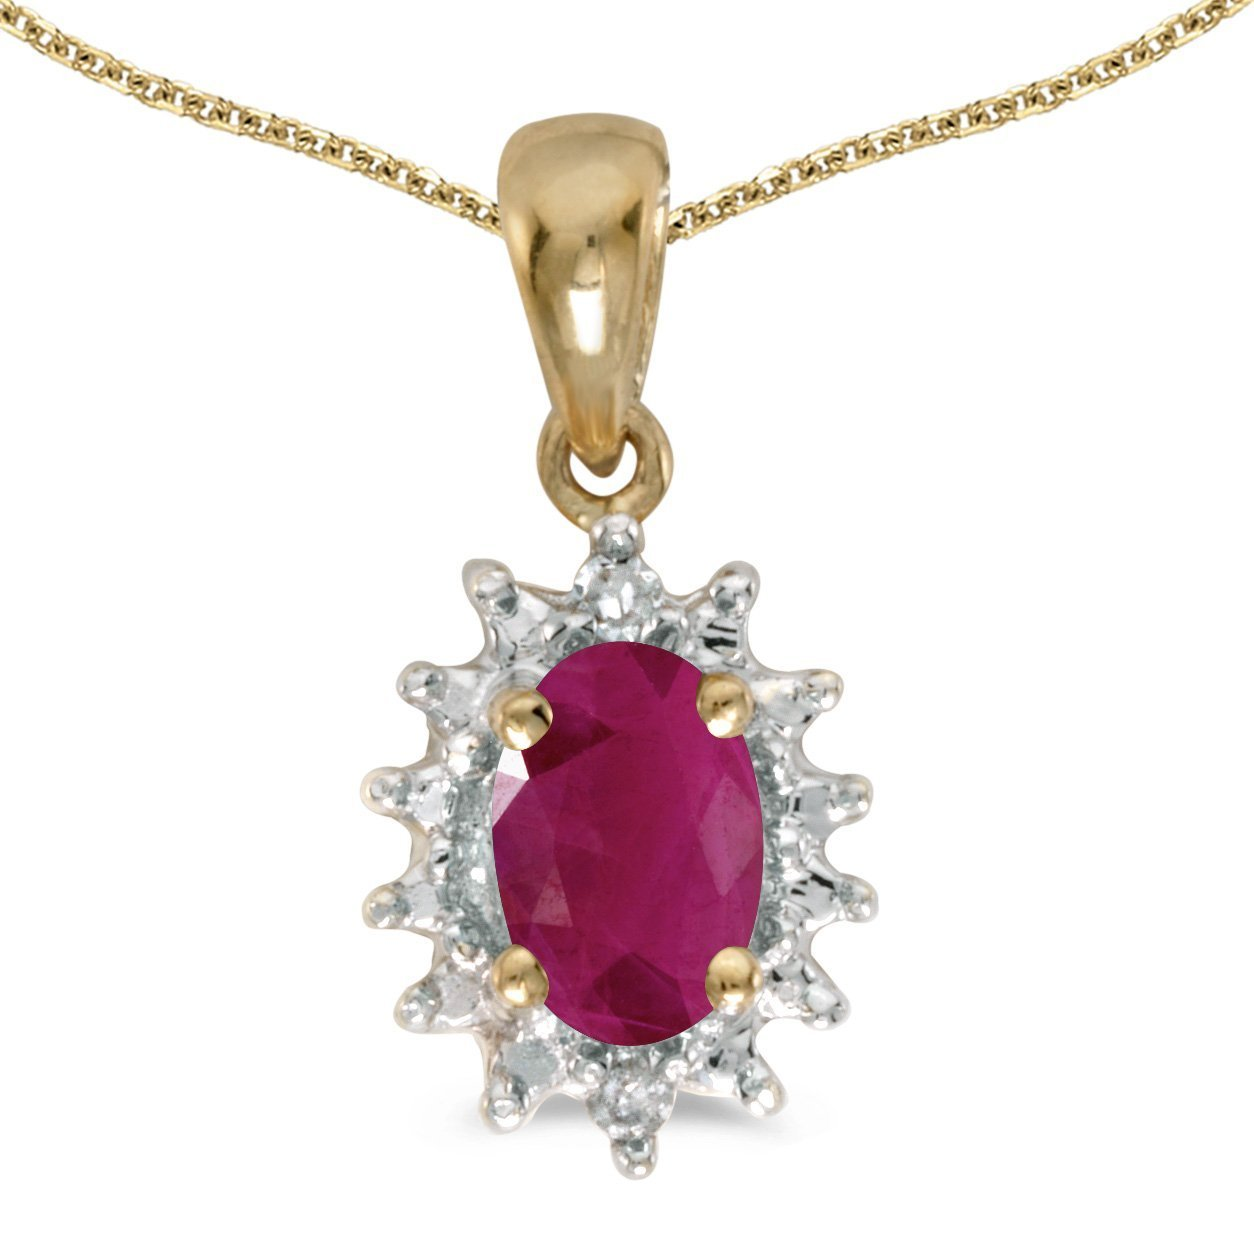 FB Jewels Solid 10k Yellow Gold Genuine Birthstone Oval Gemstone And Diamond Pendant 0.47 Cttw.